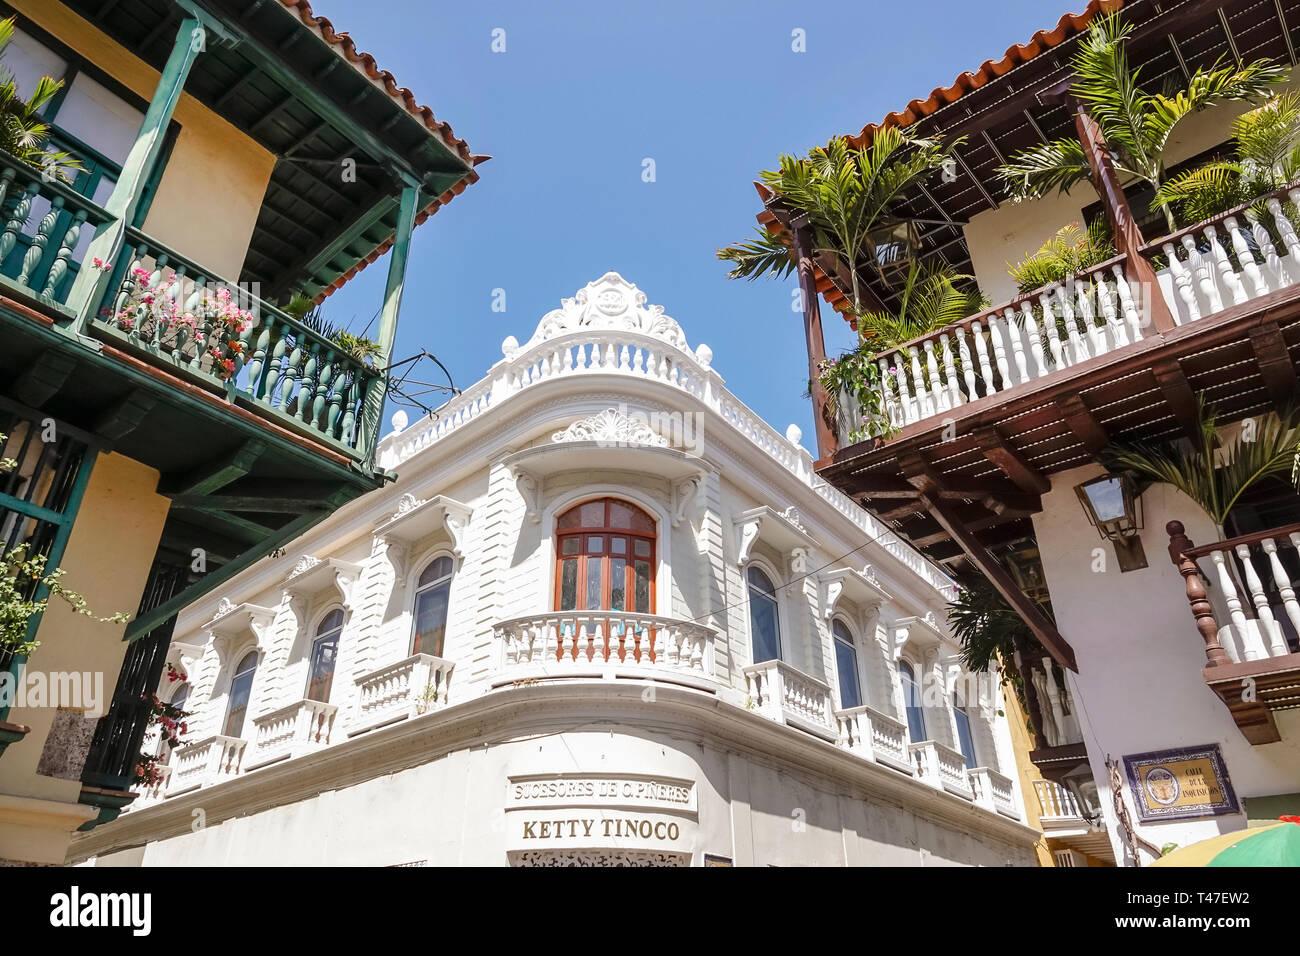 Colombia, Cartagena, Old Walled City Center centre, Centro, Edificio Pineres, colonial architecture wood balconies, building exterior, balustrade, Ket Stock Photo